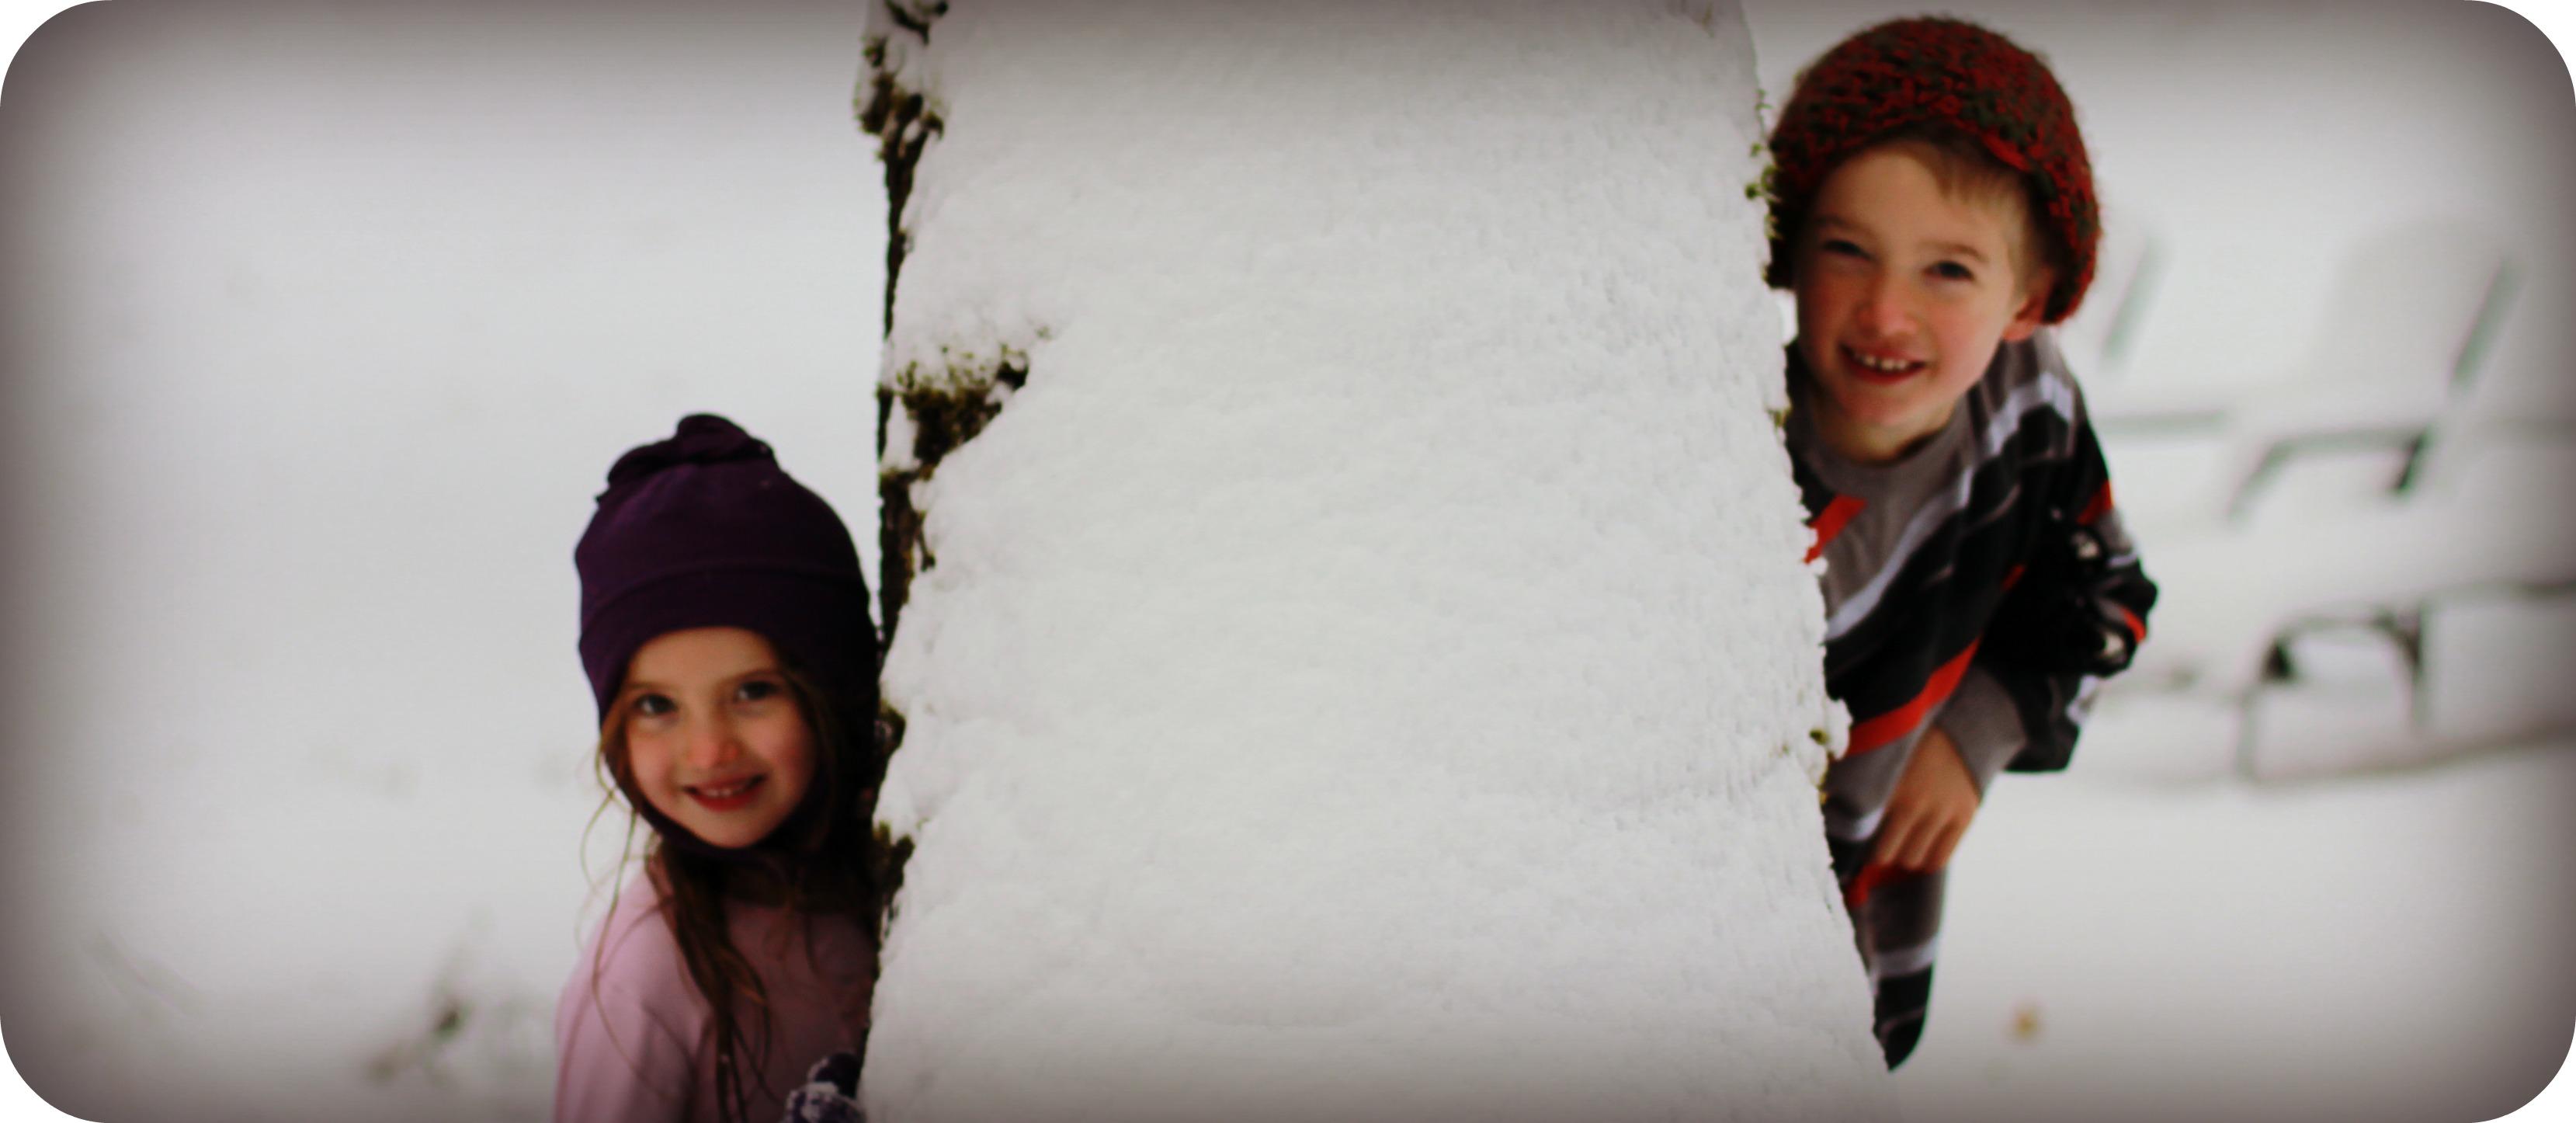 Snowy Day Header